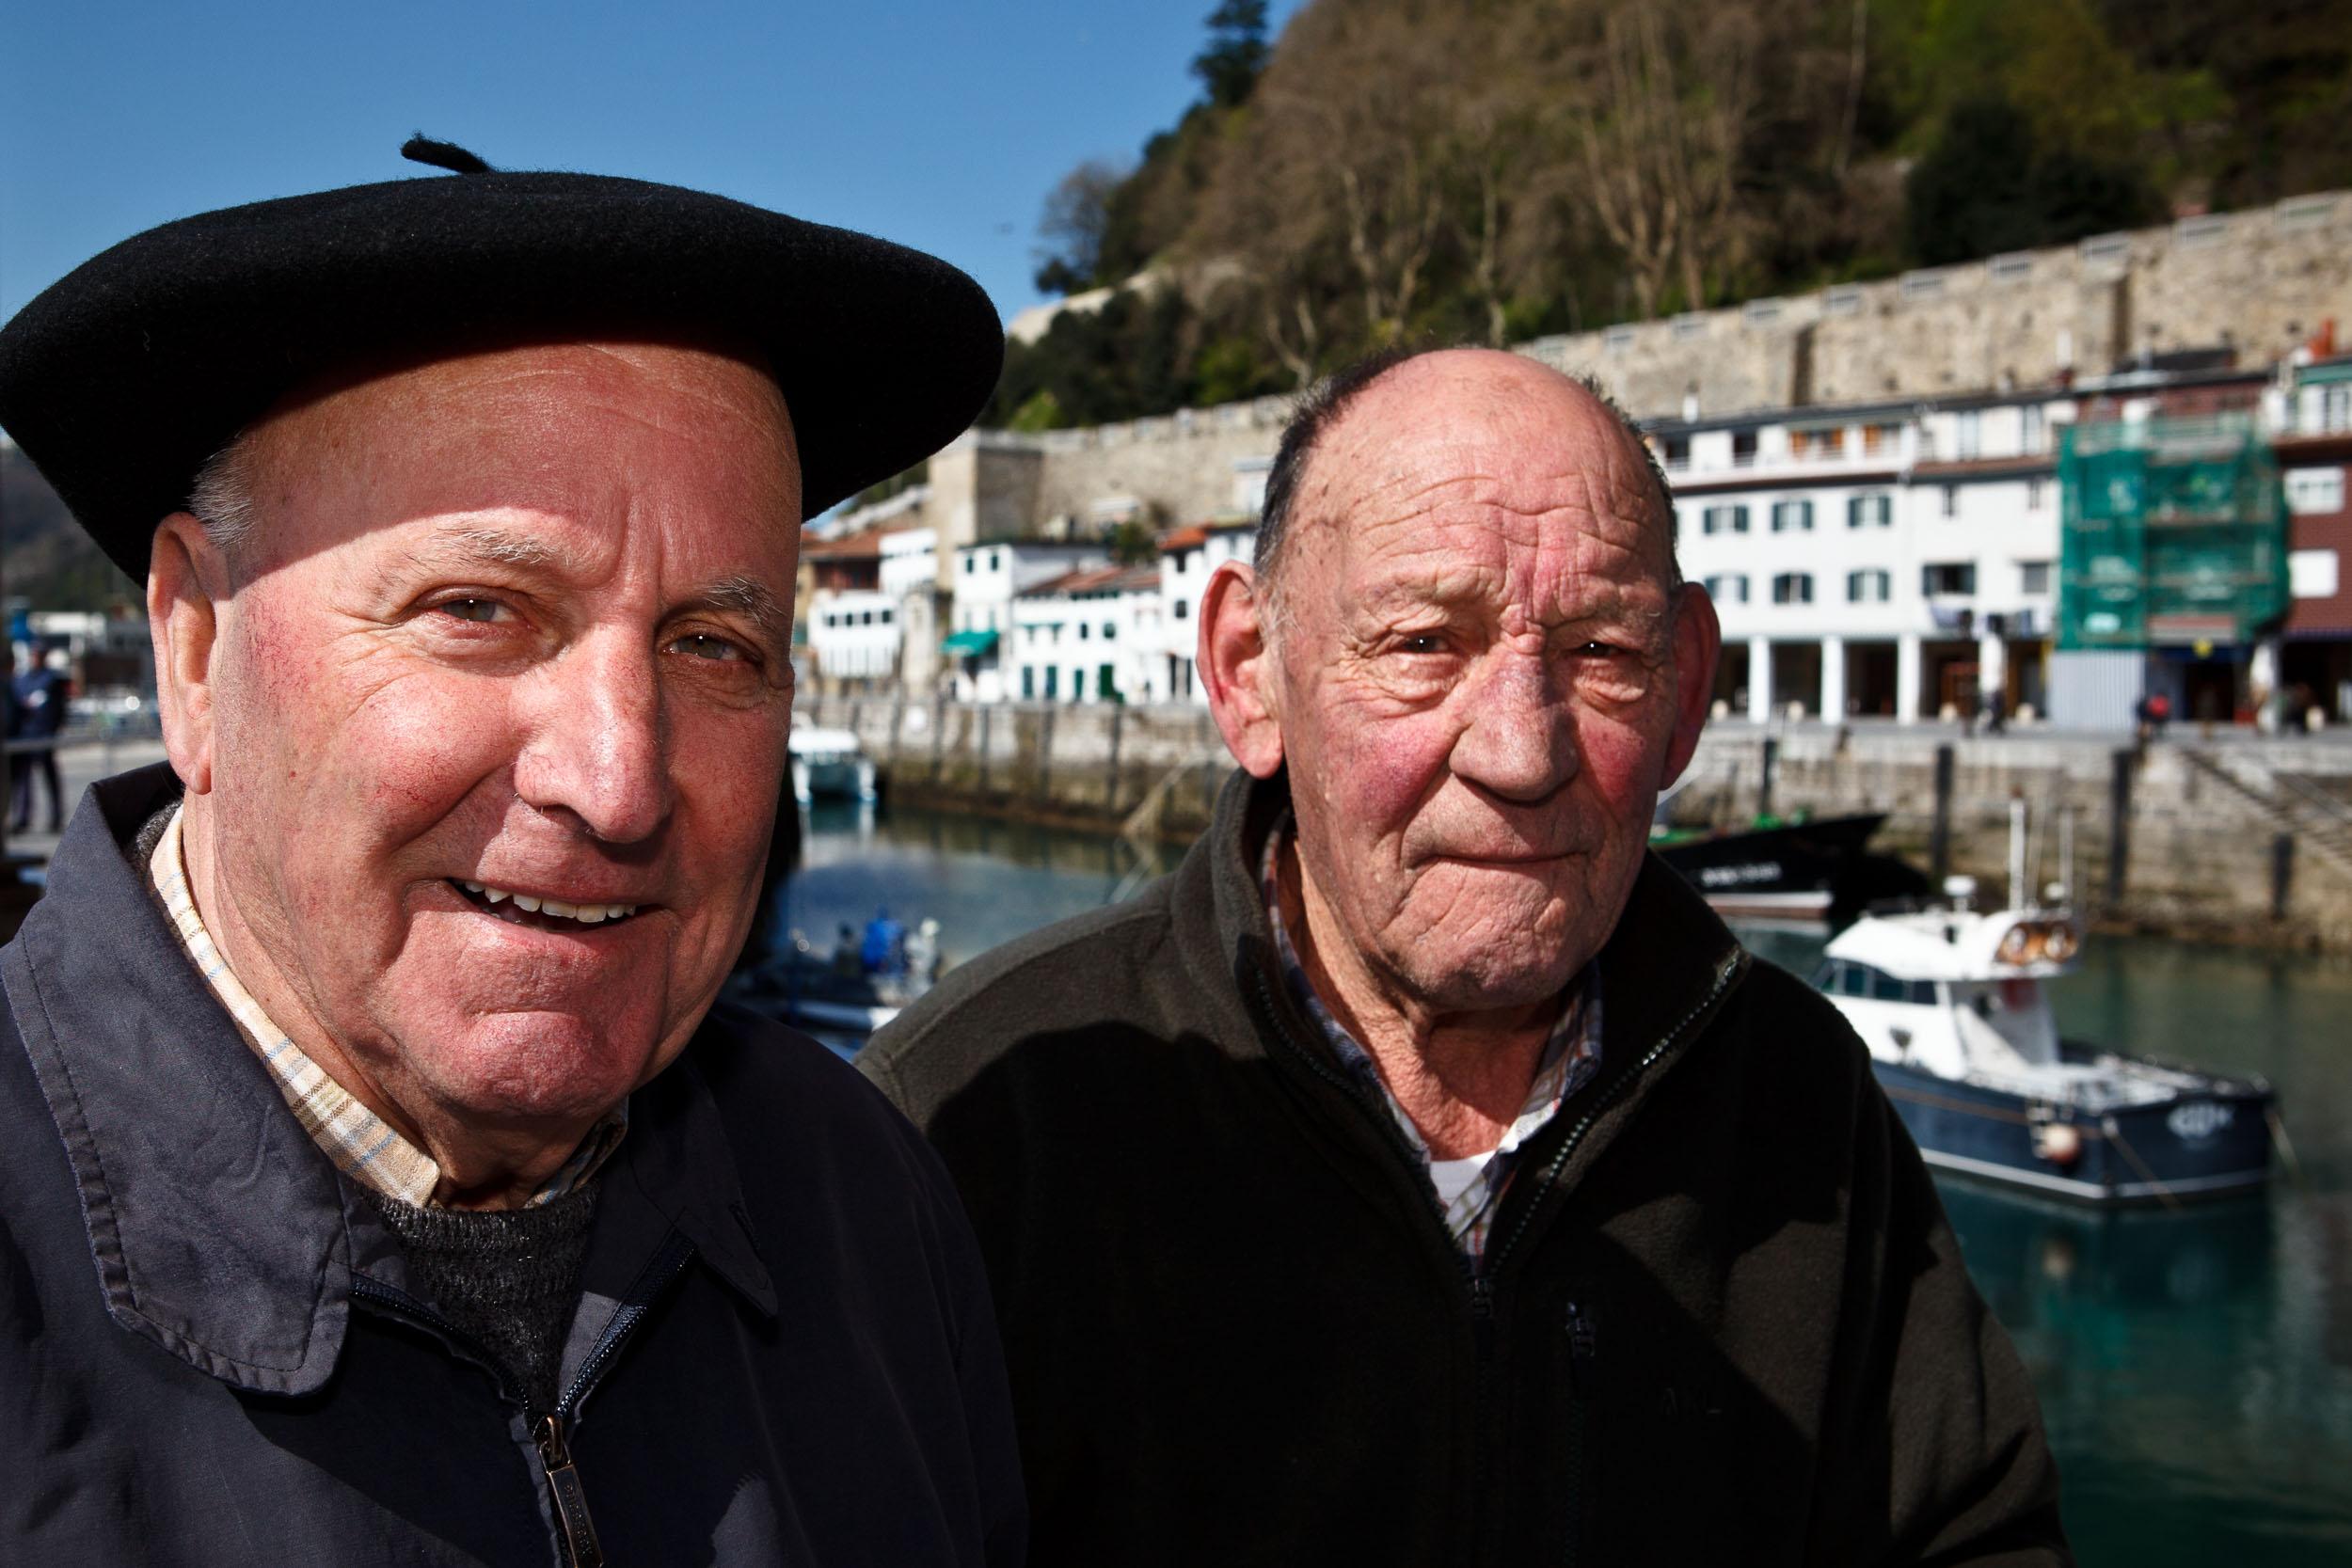 Retired fishermen, Miguel (left) and Inocencio,  San Sebastián, Spain.